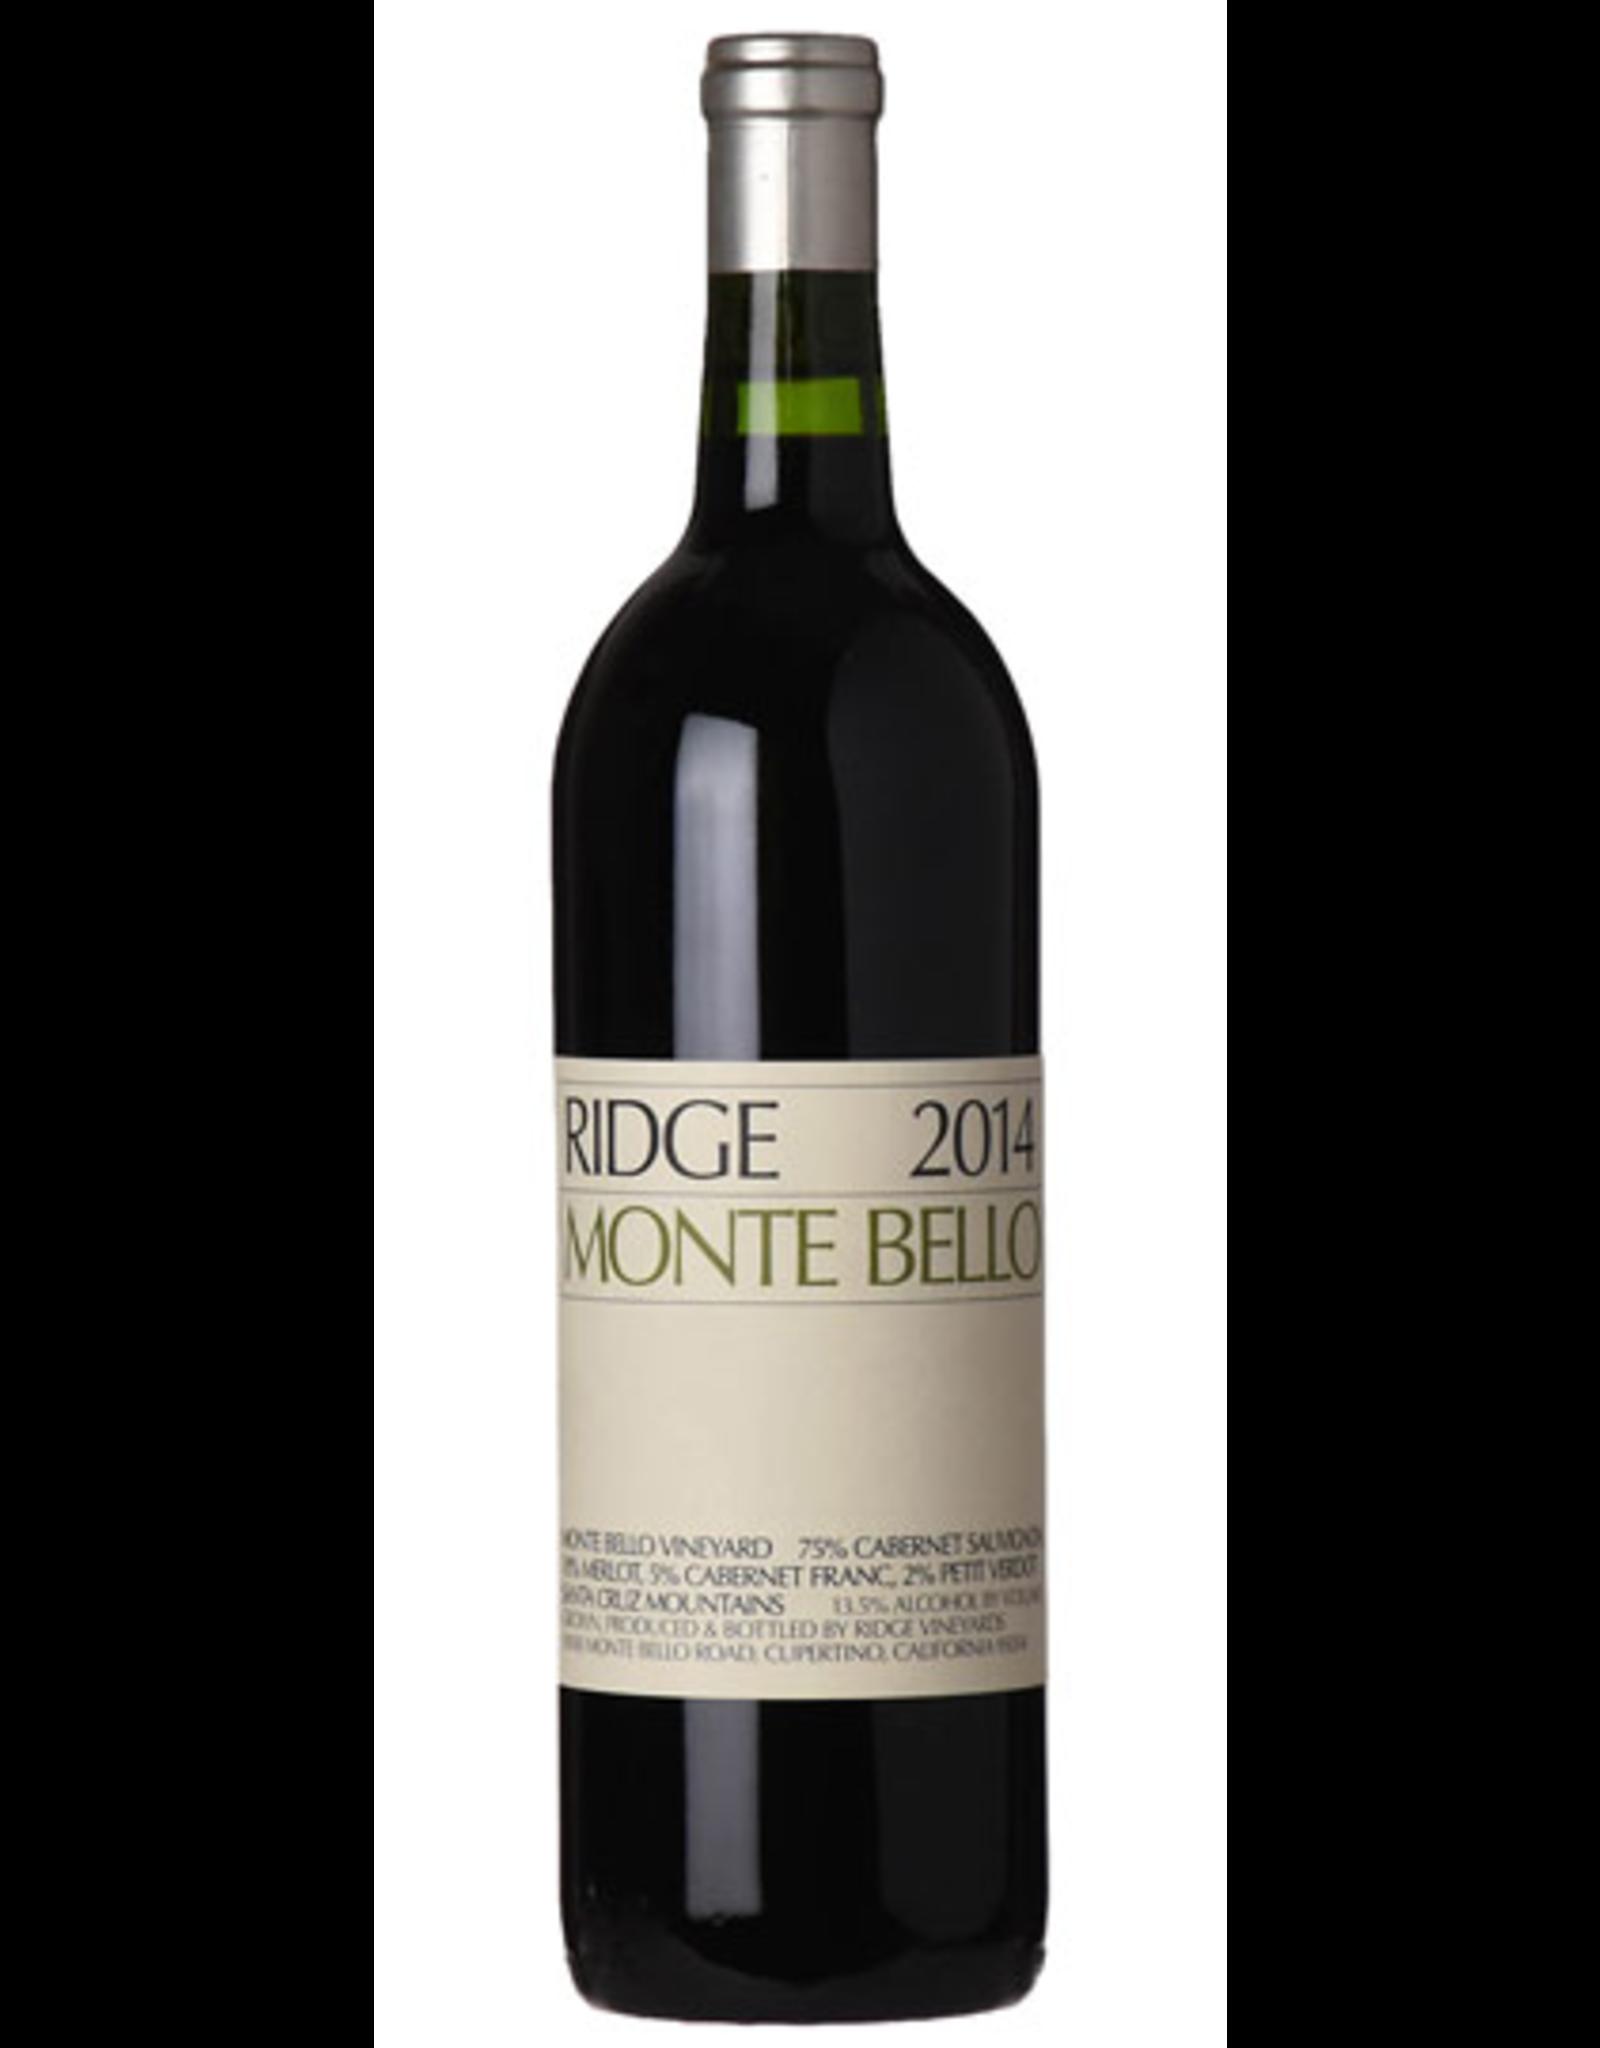 Red Wine 2014, Ridge Stanford Collector's Reserve Monte Bello Vineyards, Cabernet Sauvignon, Santa Cruz Mountains, San Francisco Bay, California, 14.4% Alc, CT , JS98